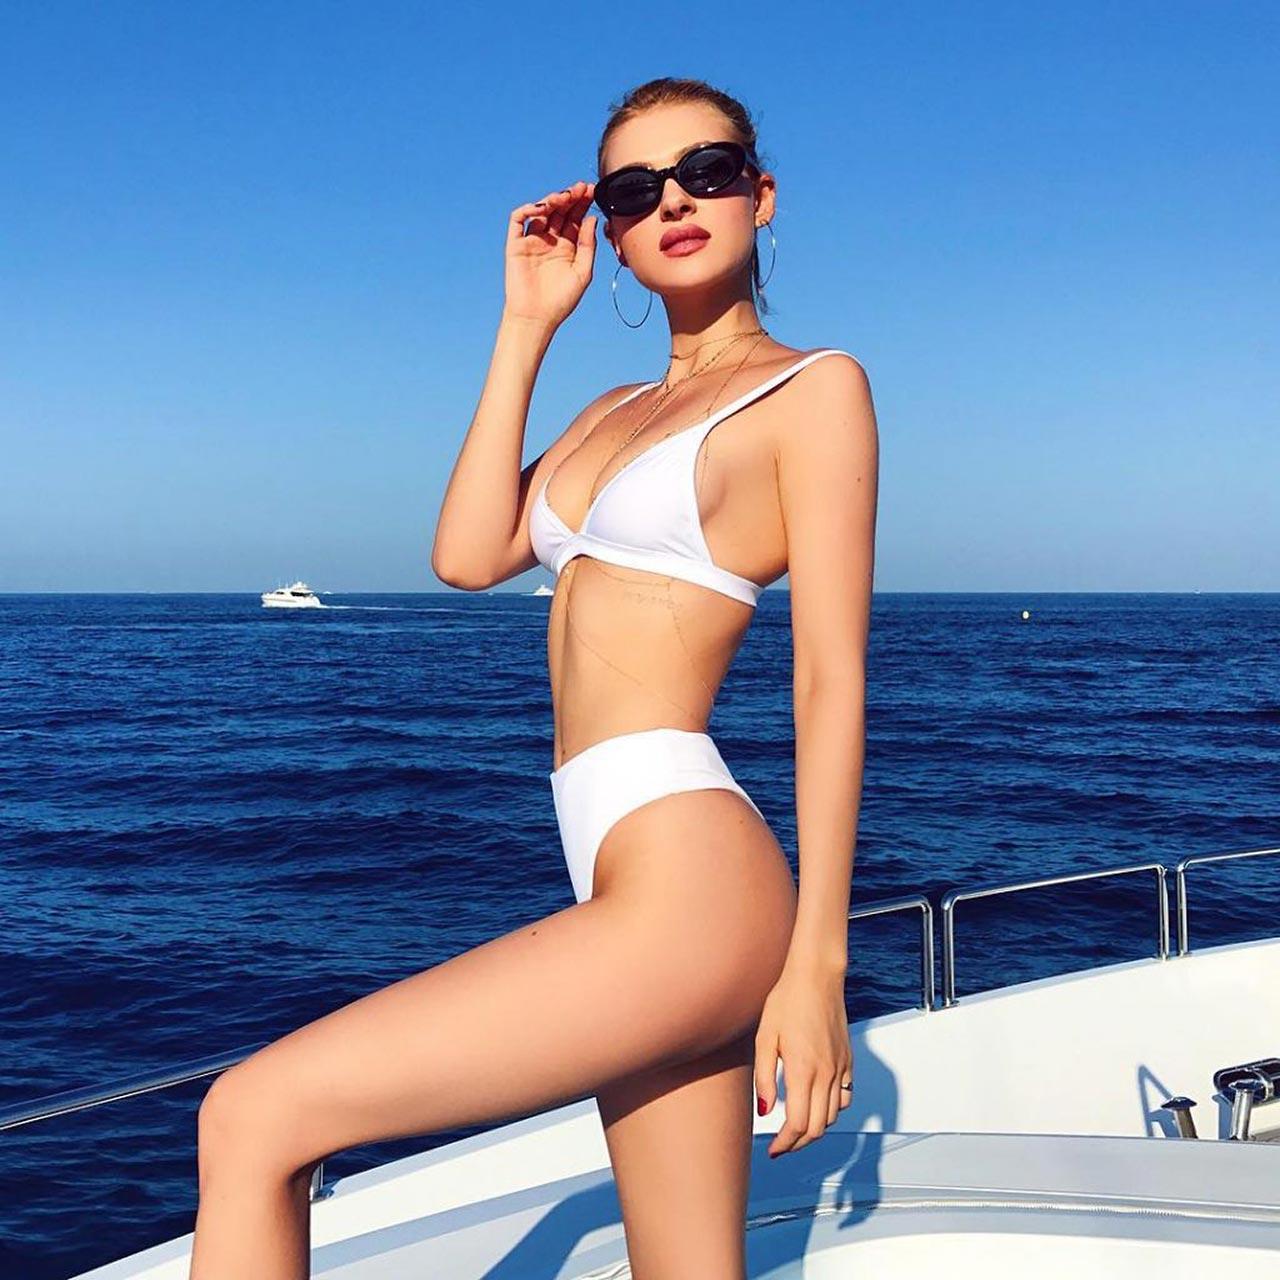 Young Aisleyne Horgan-Wallace nudes (18 photos), Tits, Fappening, Instagram, panties 2015